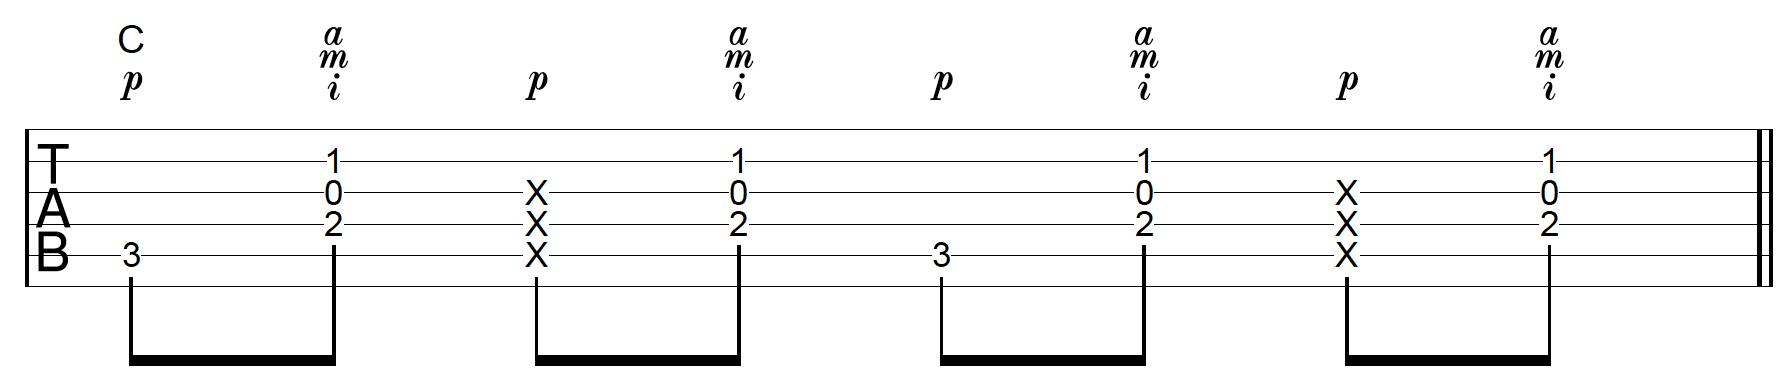 Thumb Slap C Chord Pattern 1